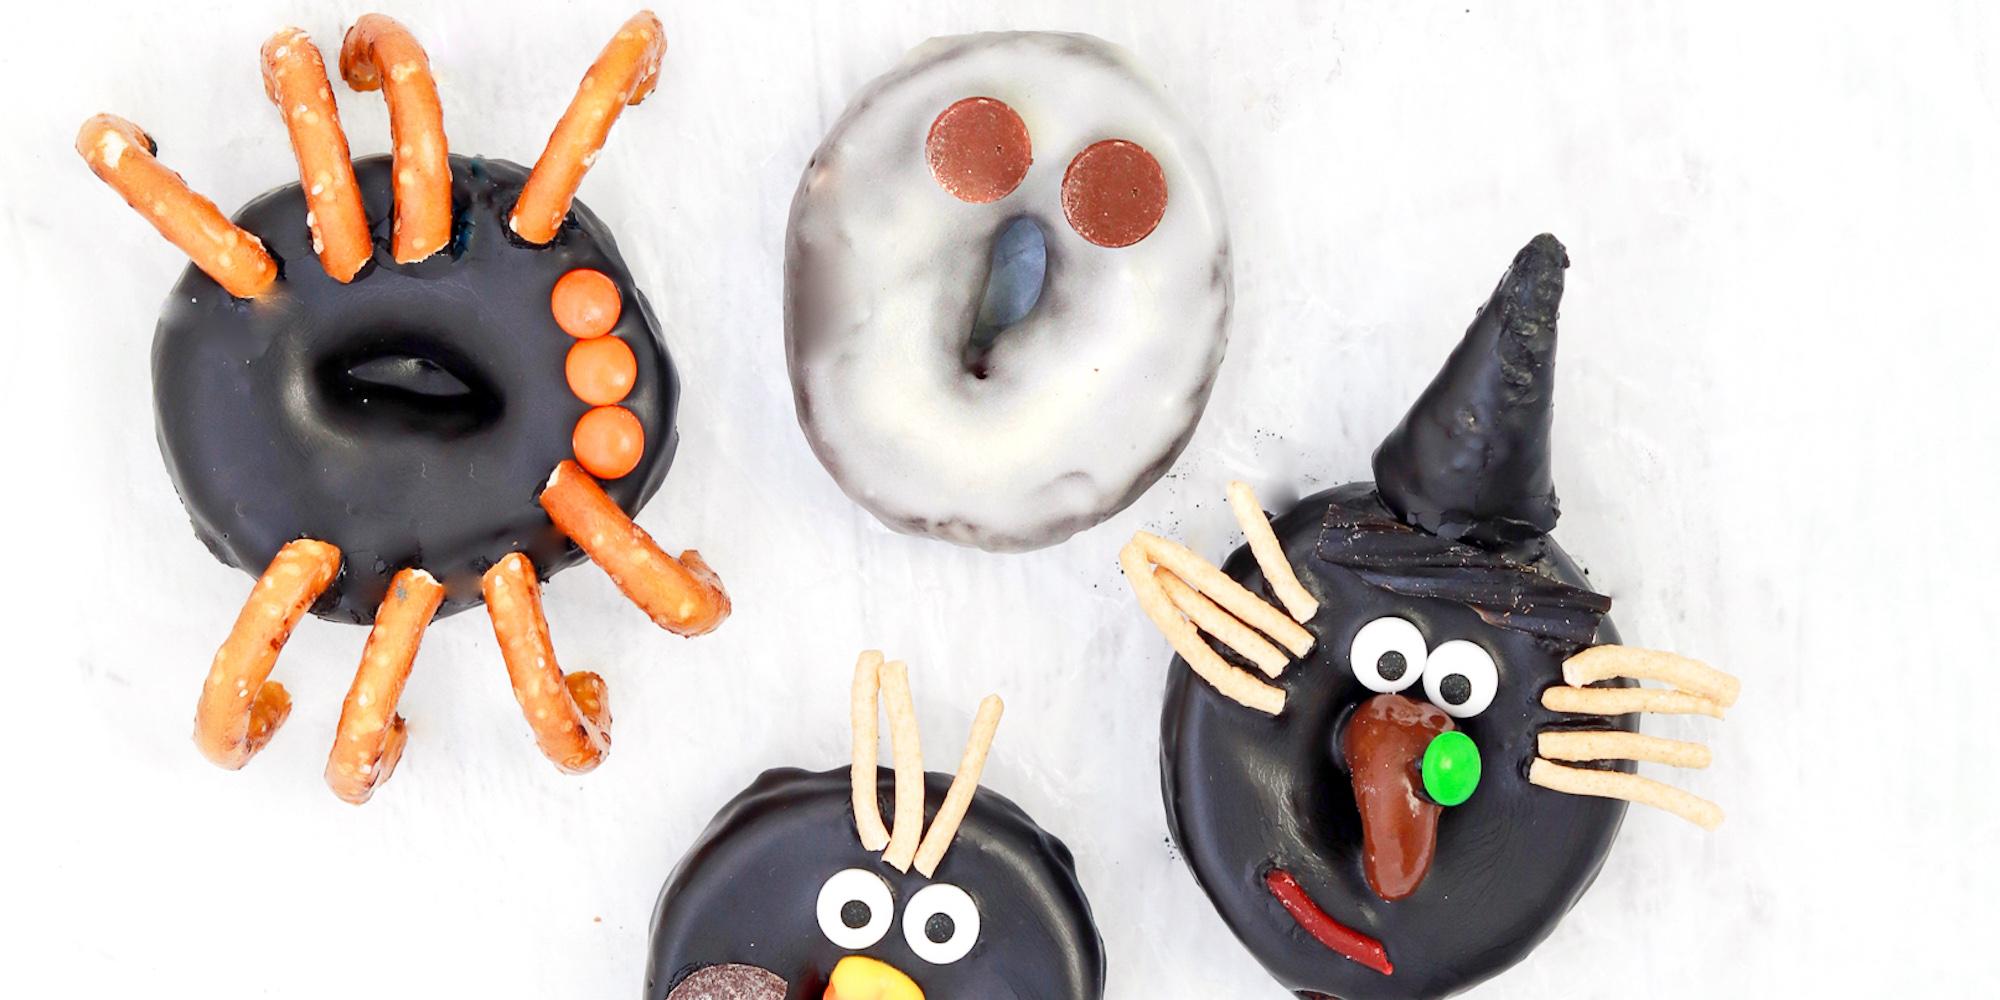 Ghoulish Gang Doughnuts Today